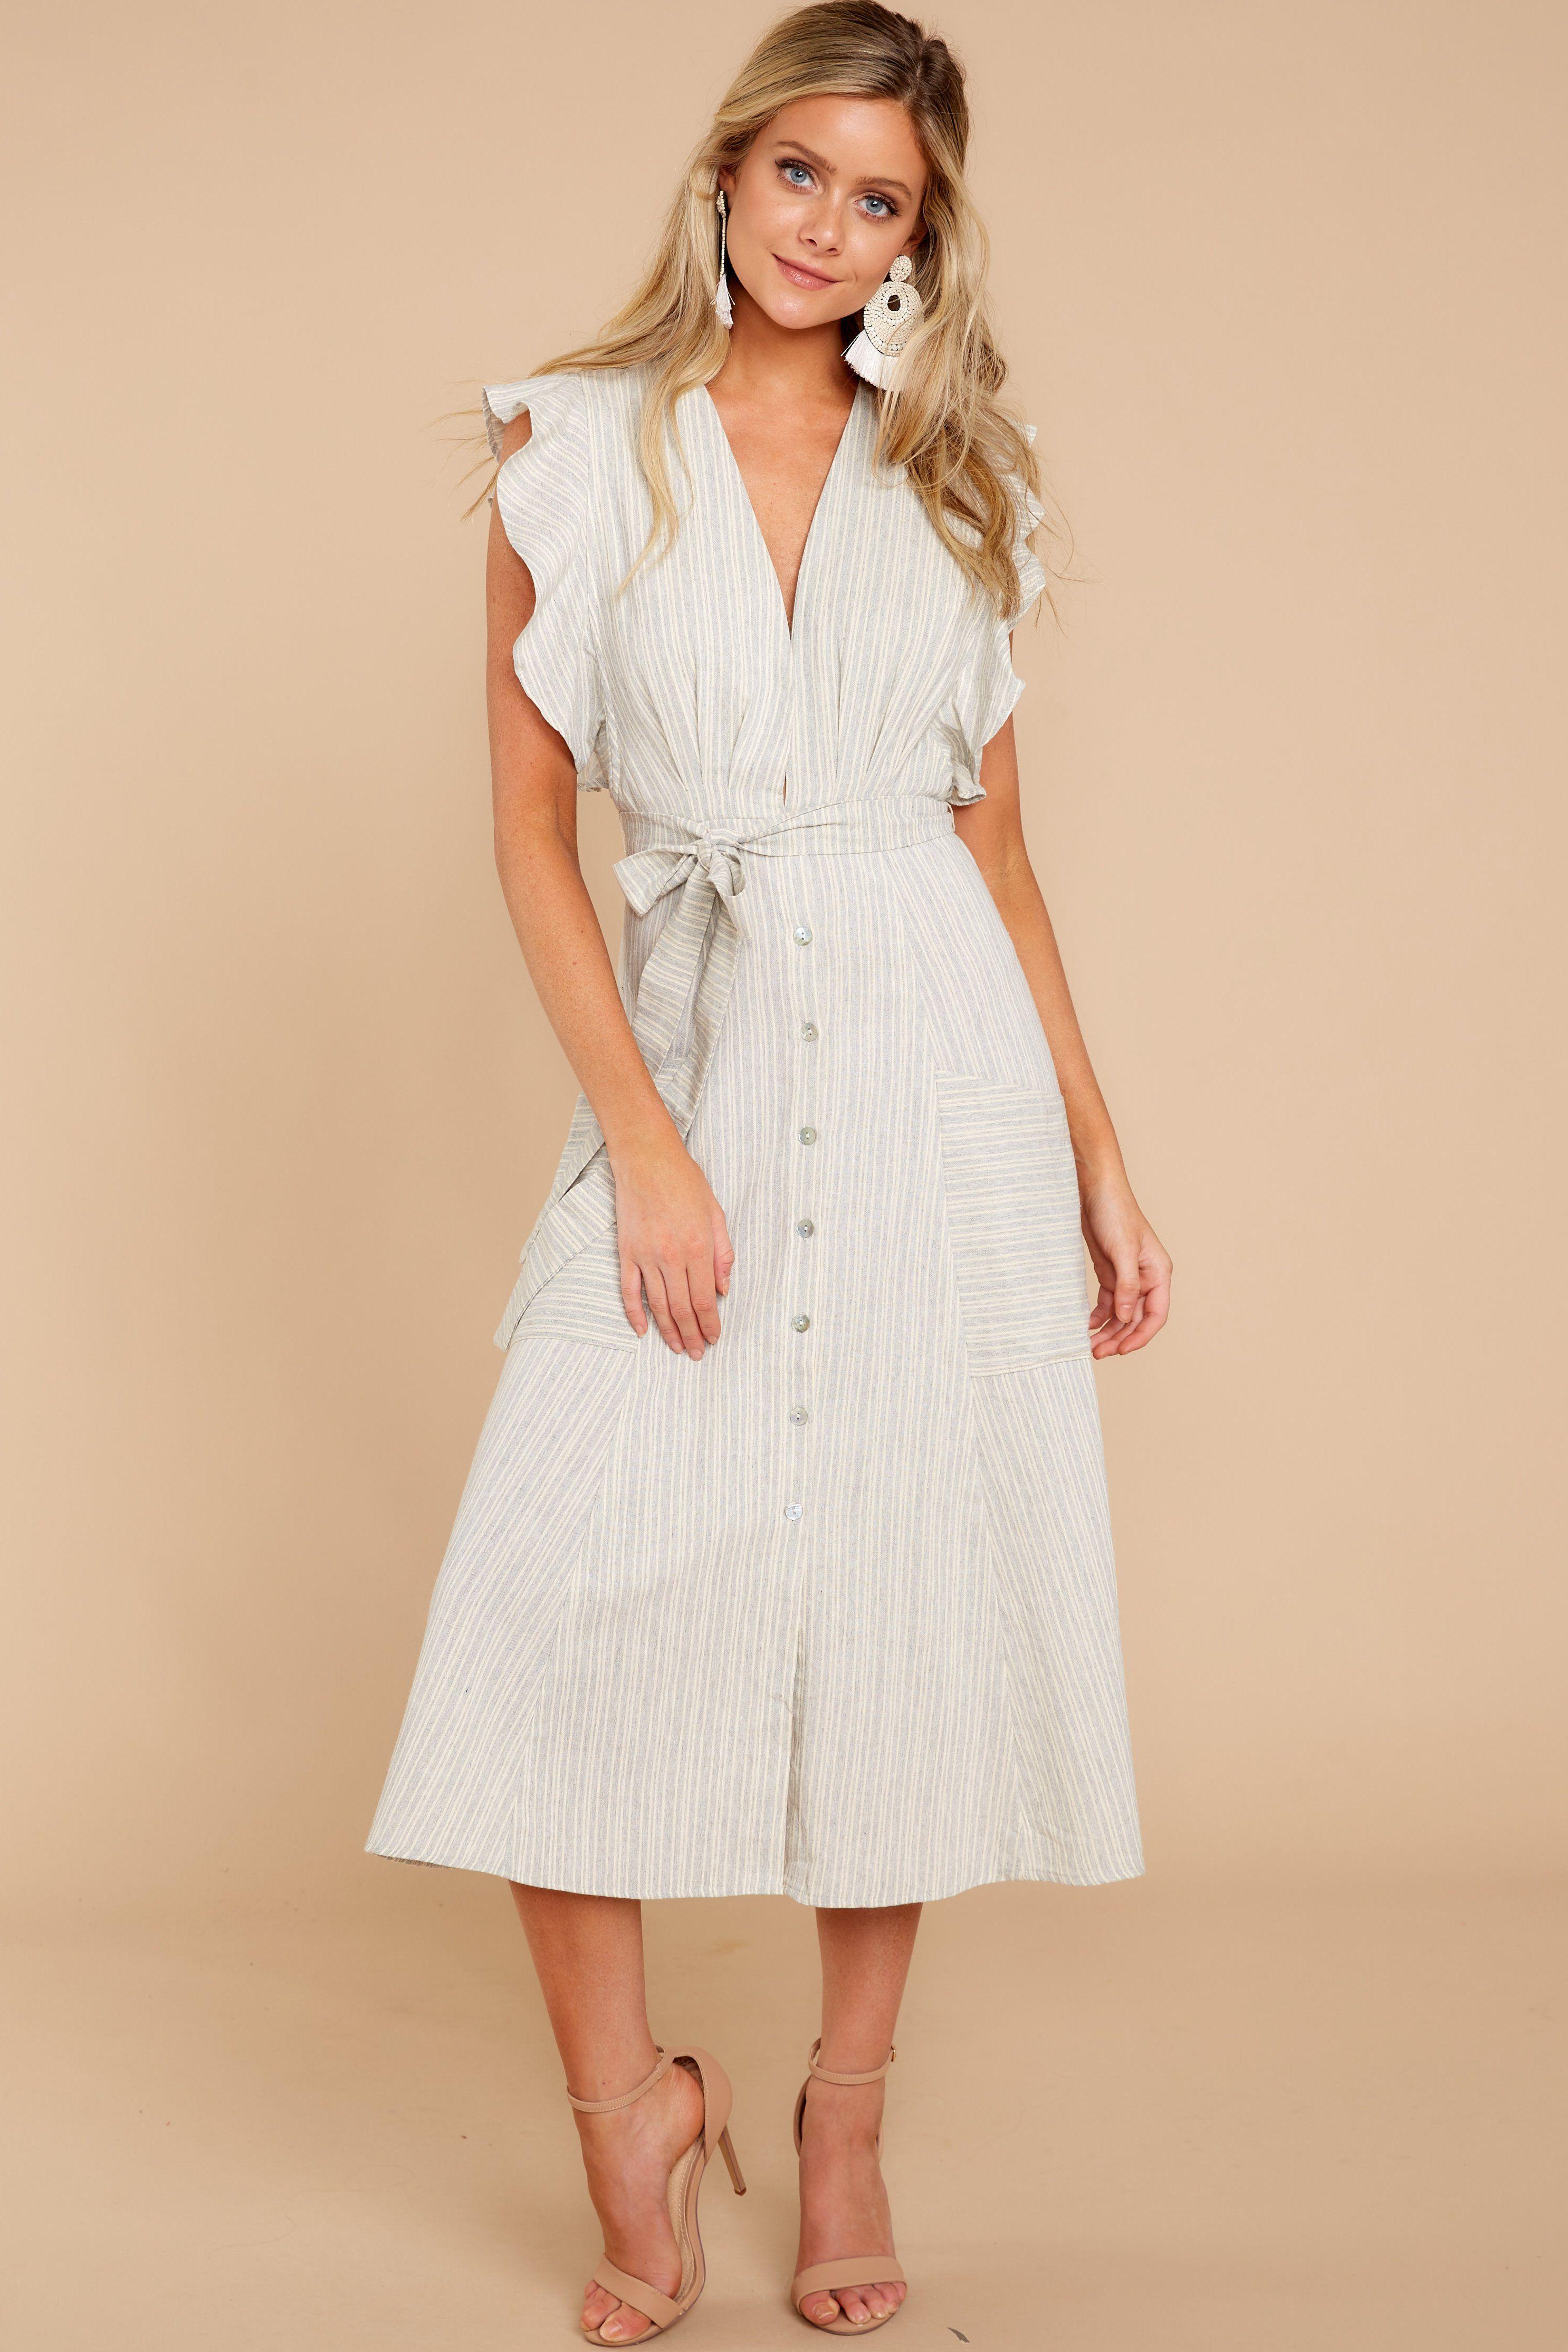 1d21580674e Get It Back Grey Stripe Dress – Red Dress Boutique